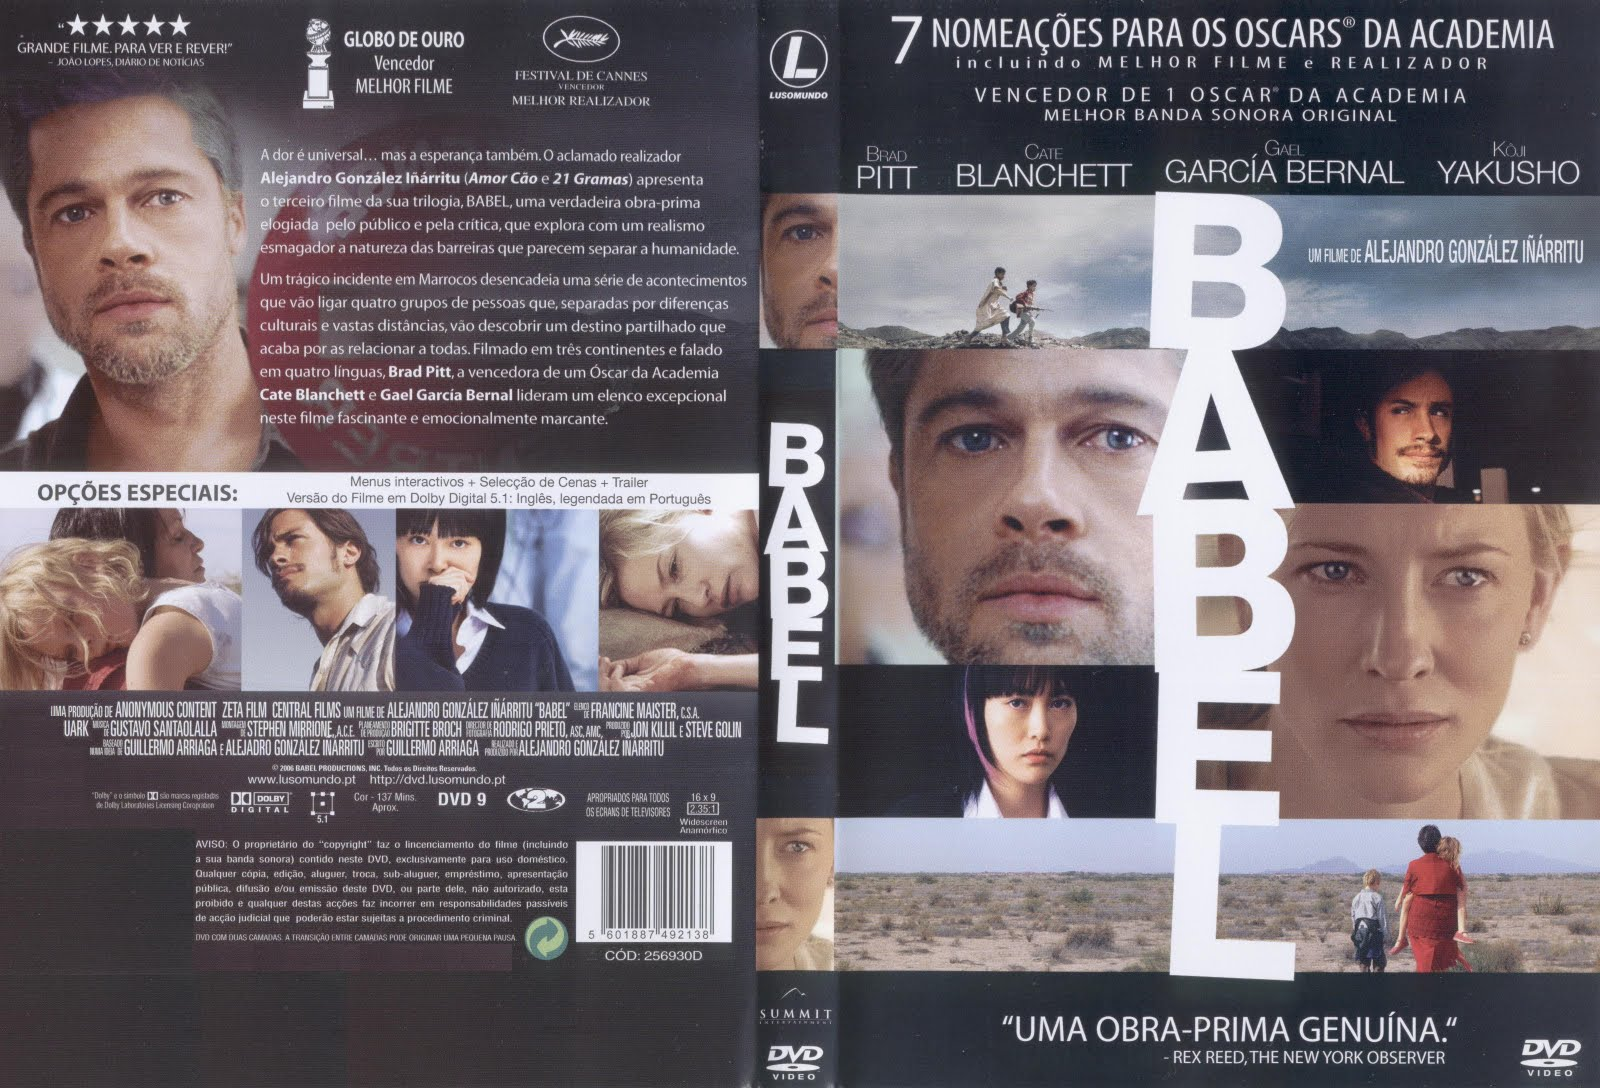 http://1.bp.blogspot.com/-O8R5EyP0HZA/ULFTVuHGabI/AAAAAAAALfI/RZ_e8RA_rEU/s1600/Babel_Portuguese_R2_Custom-%5Bcdcovers_cc%5D-front.jpg